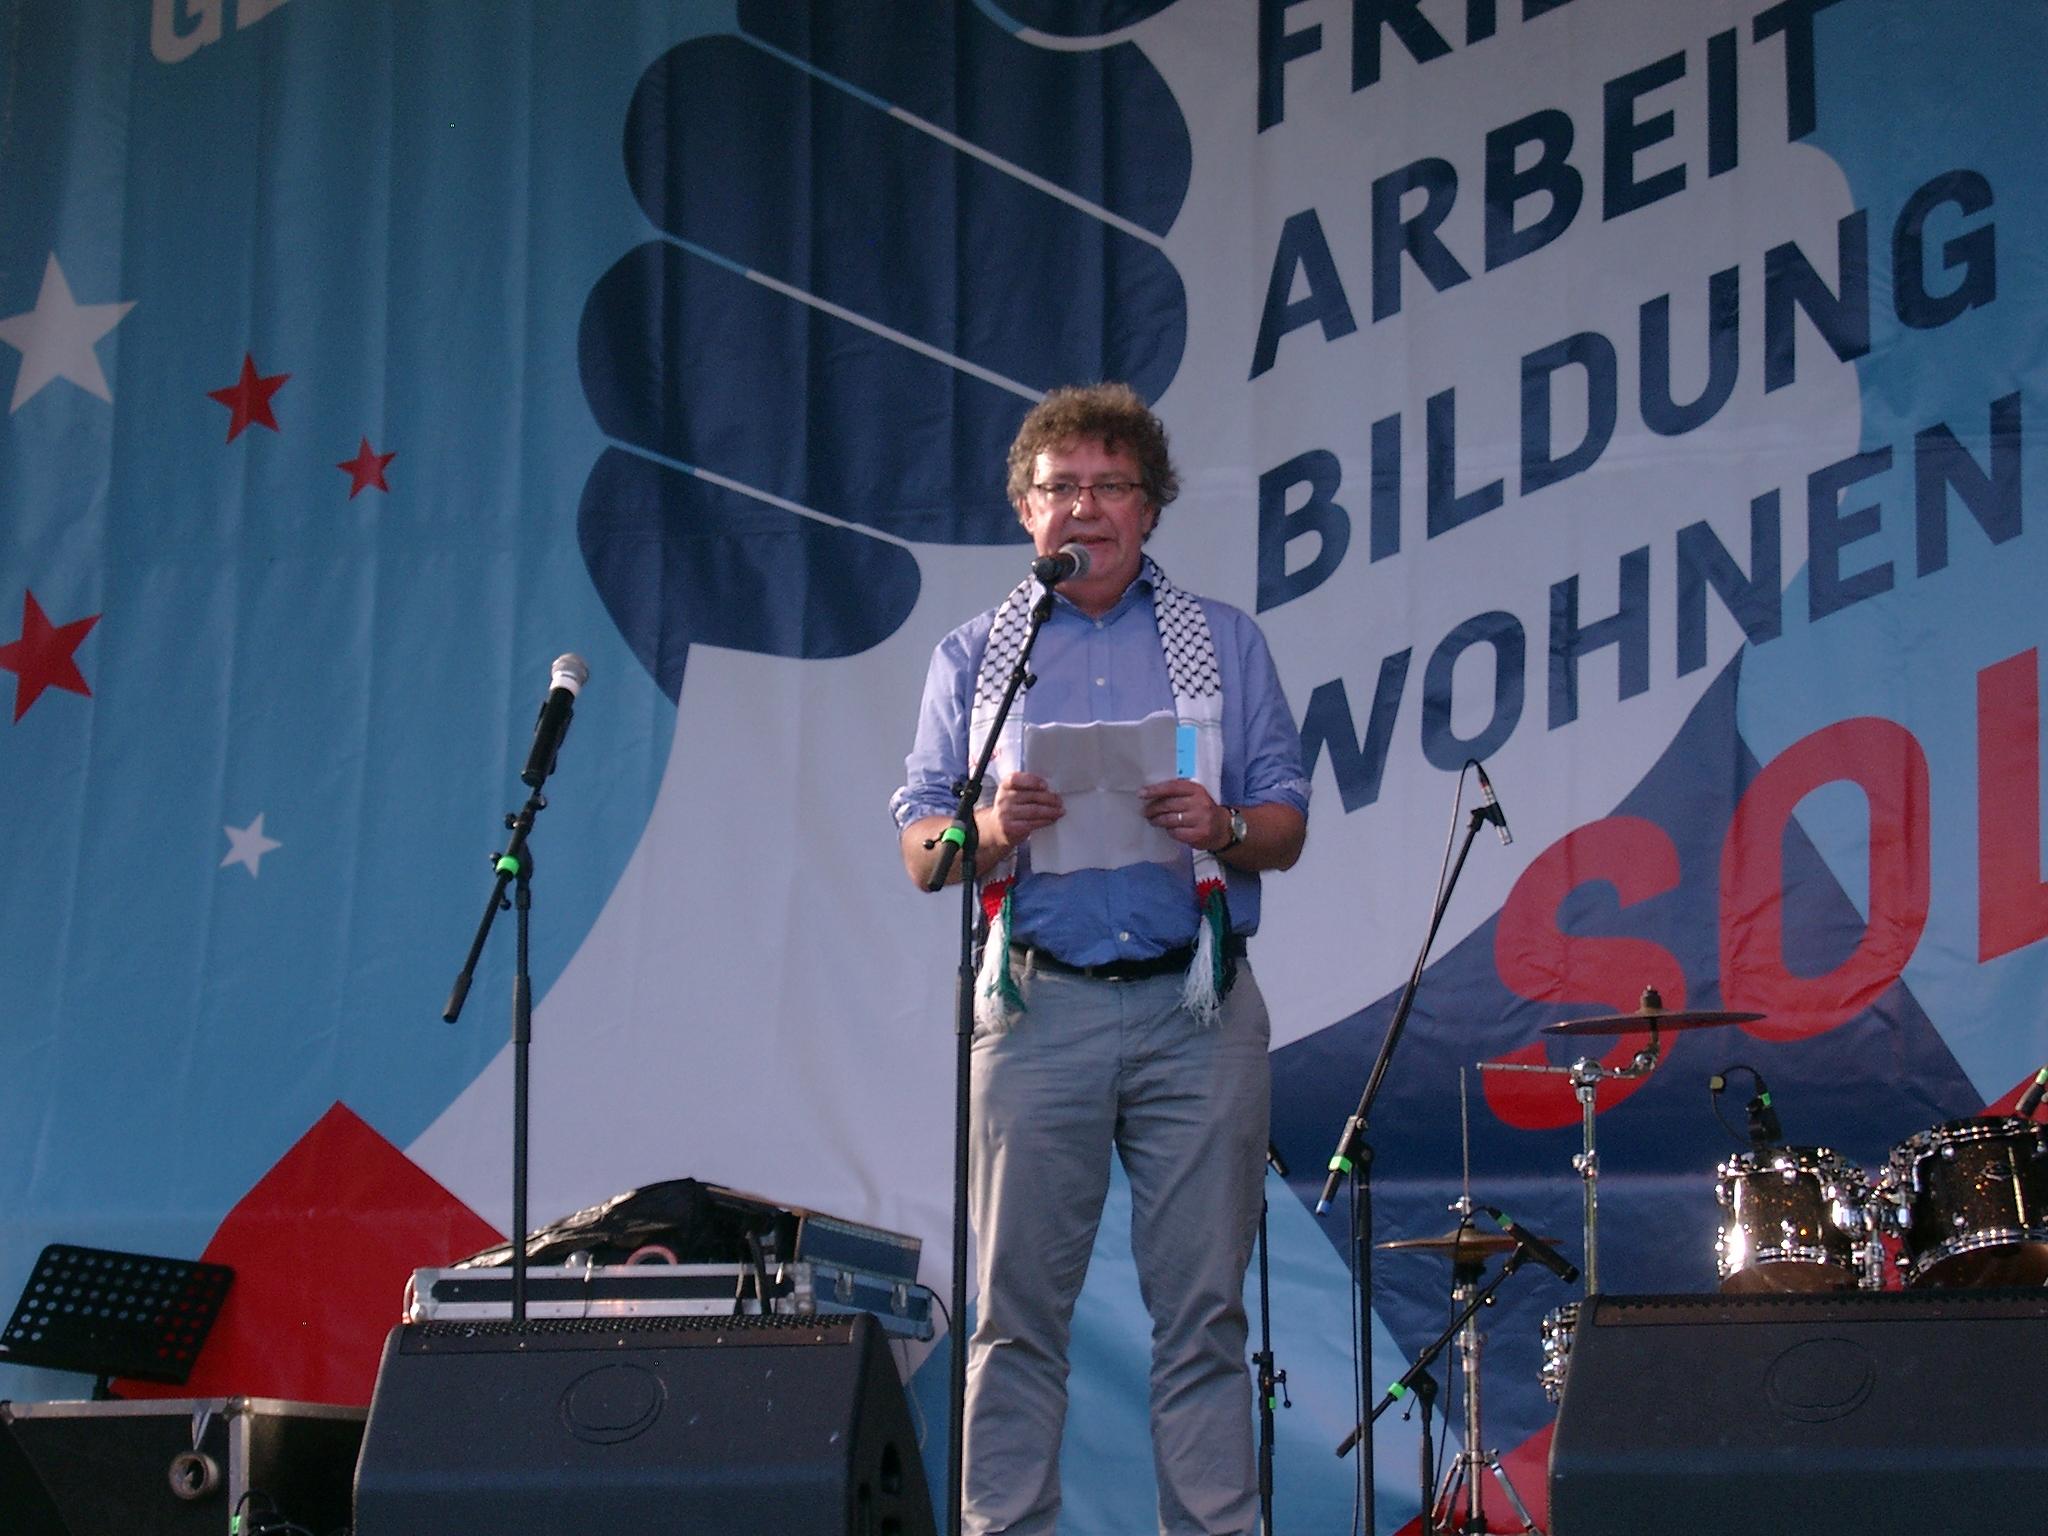 Der Vorsitzende der DKP, Patrik Köbele.